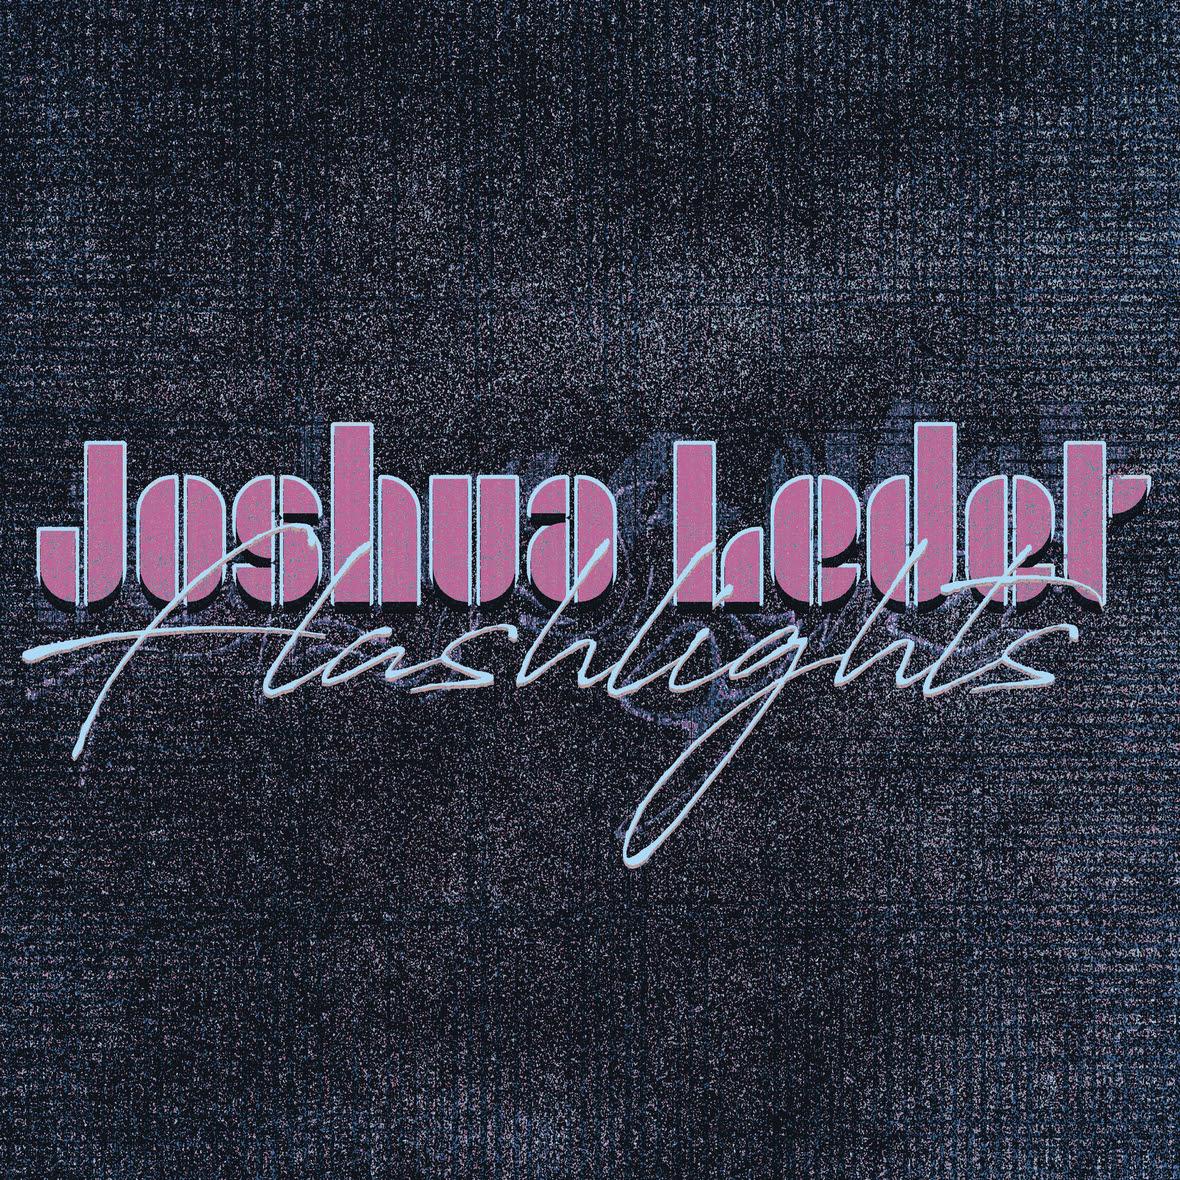 Joshua Ledet - Flashlights